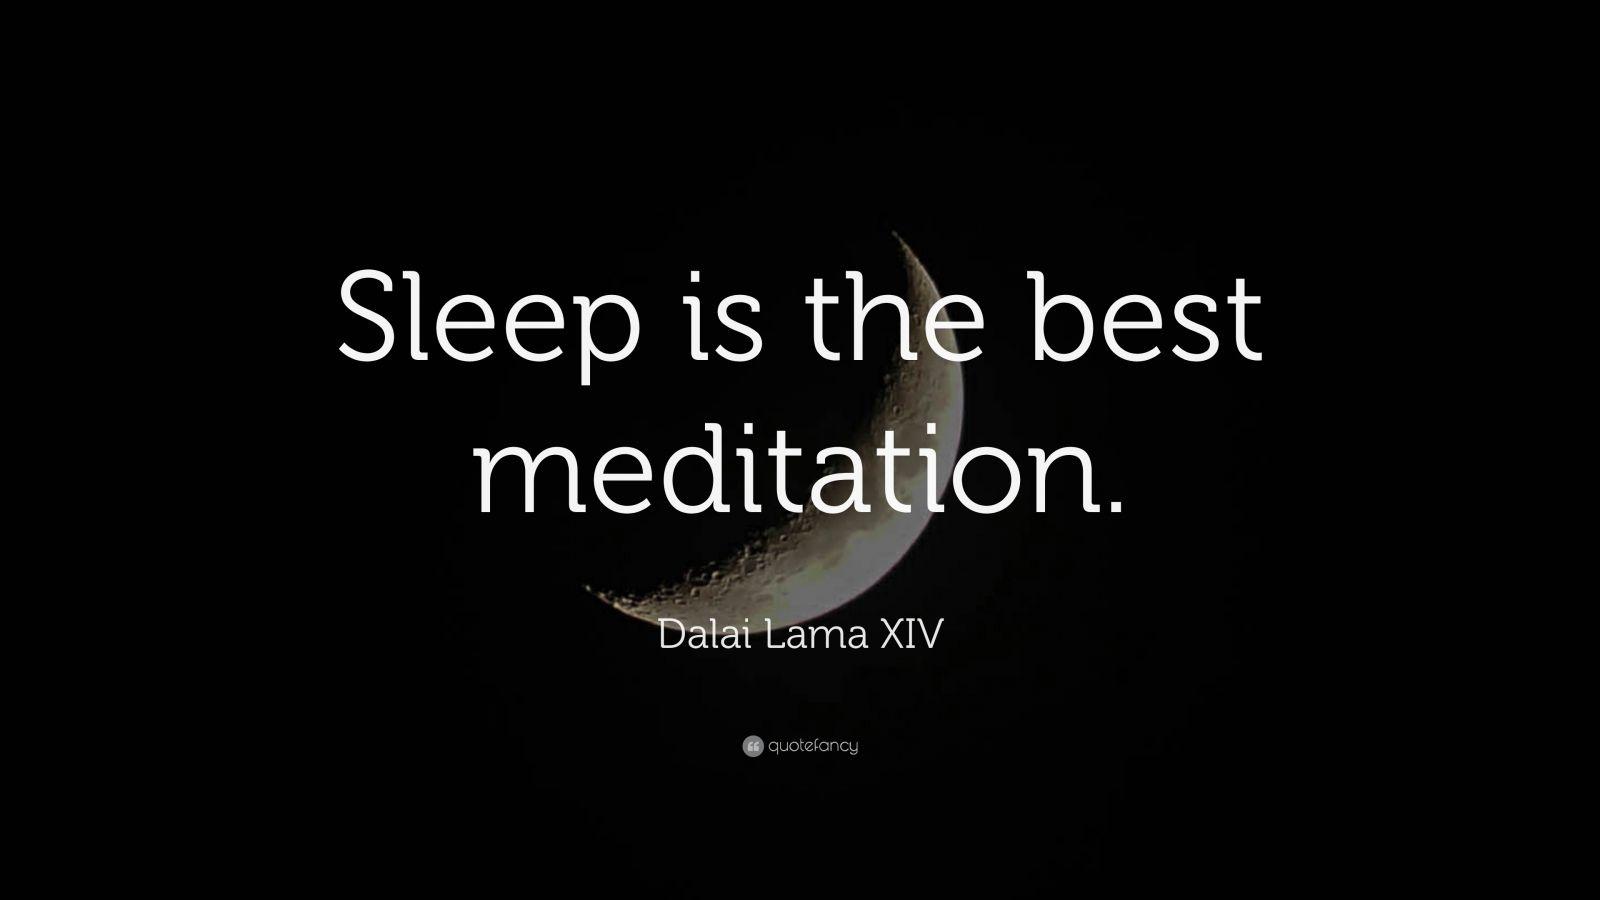 dalai lama xiv quote sleep is the best meditation